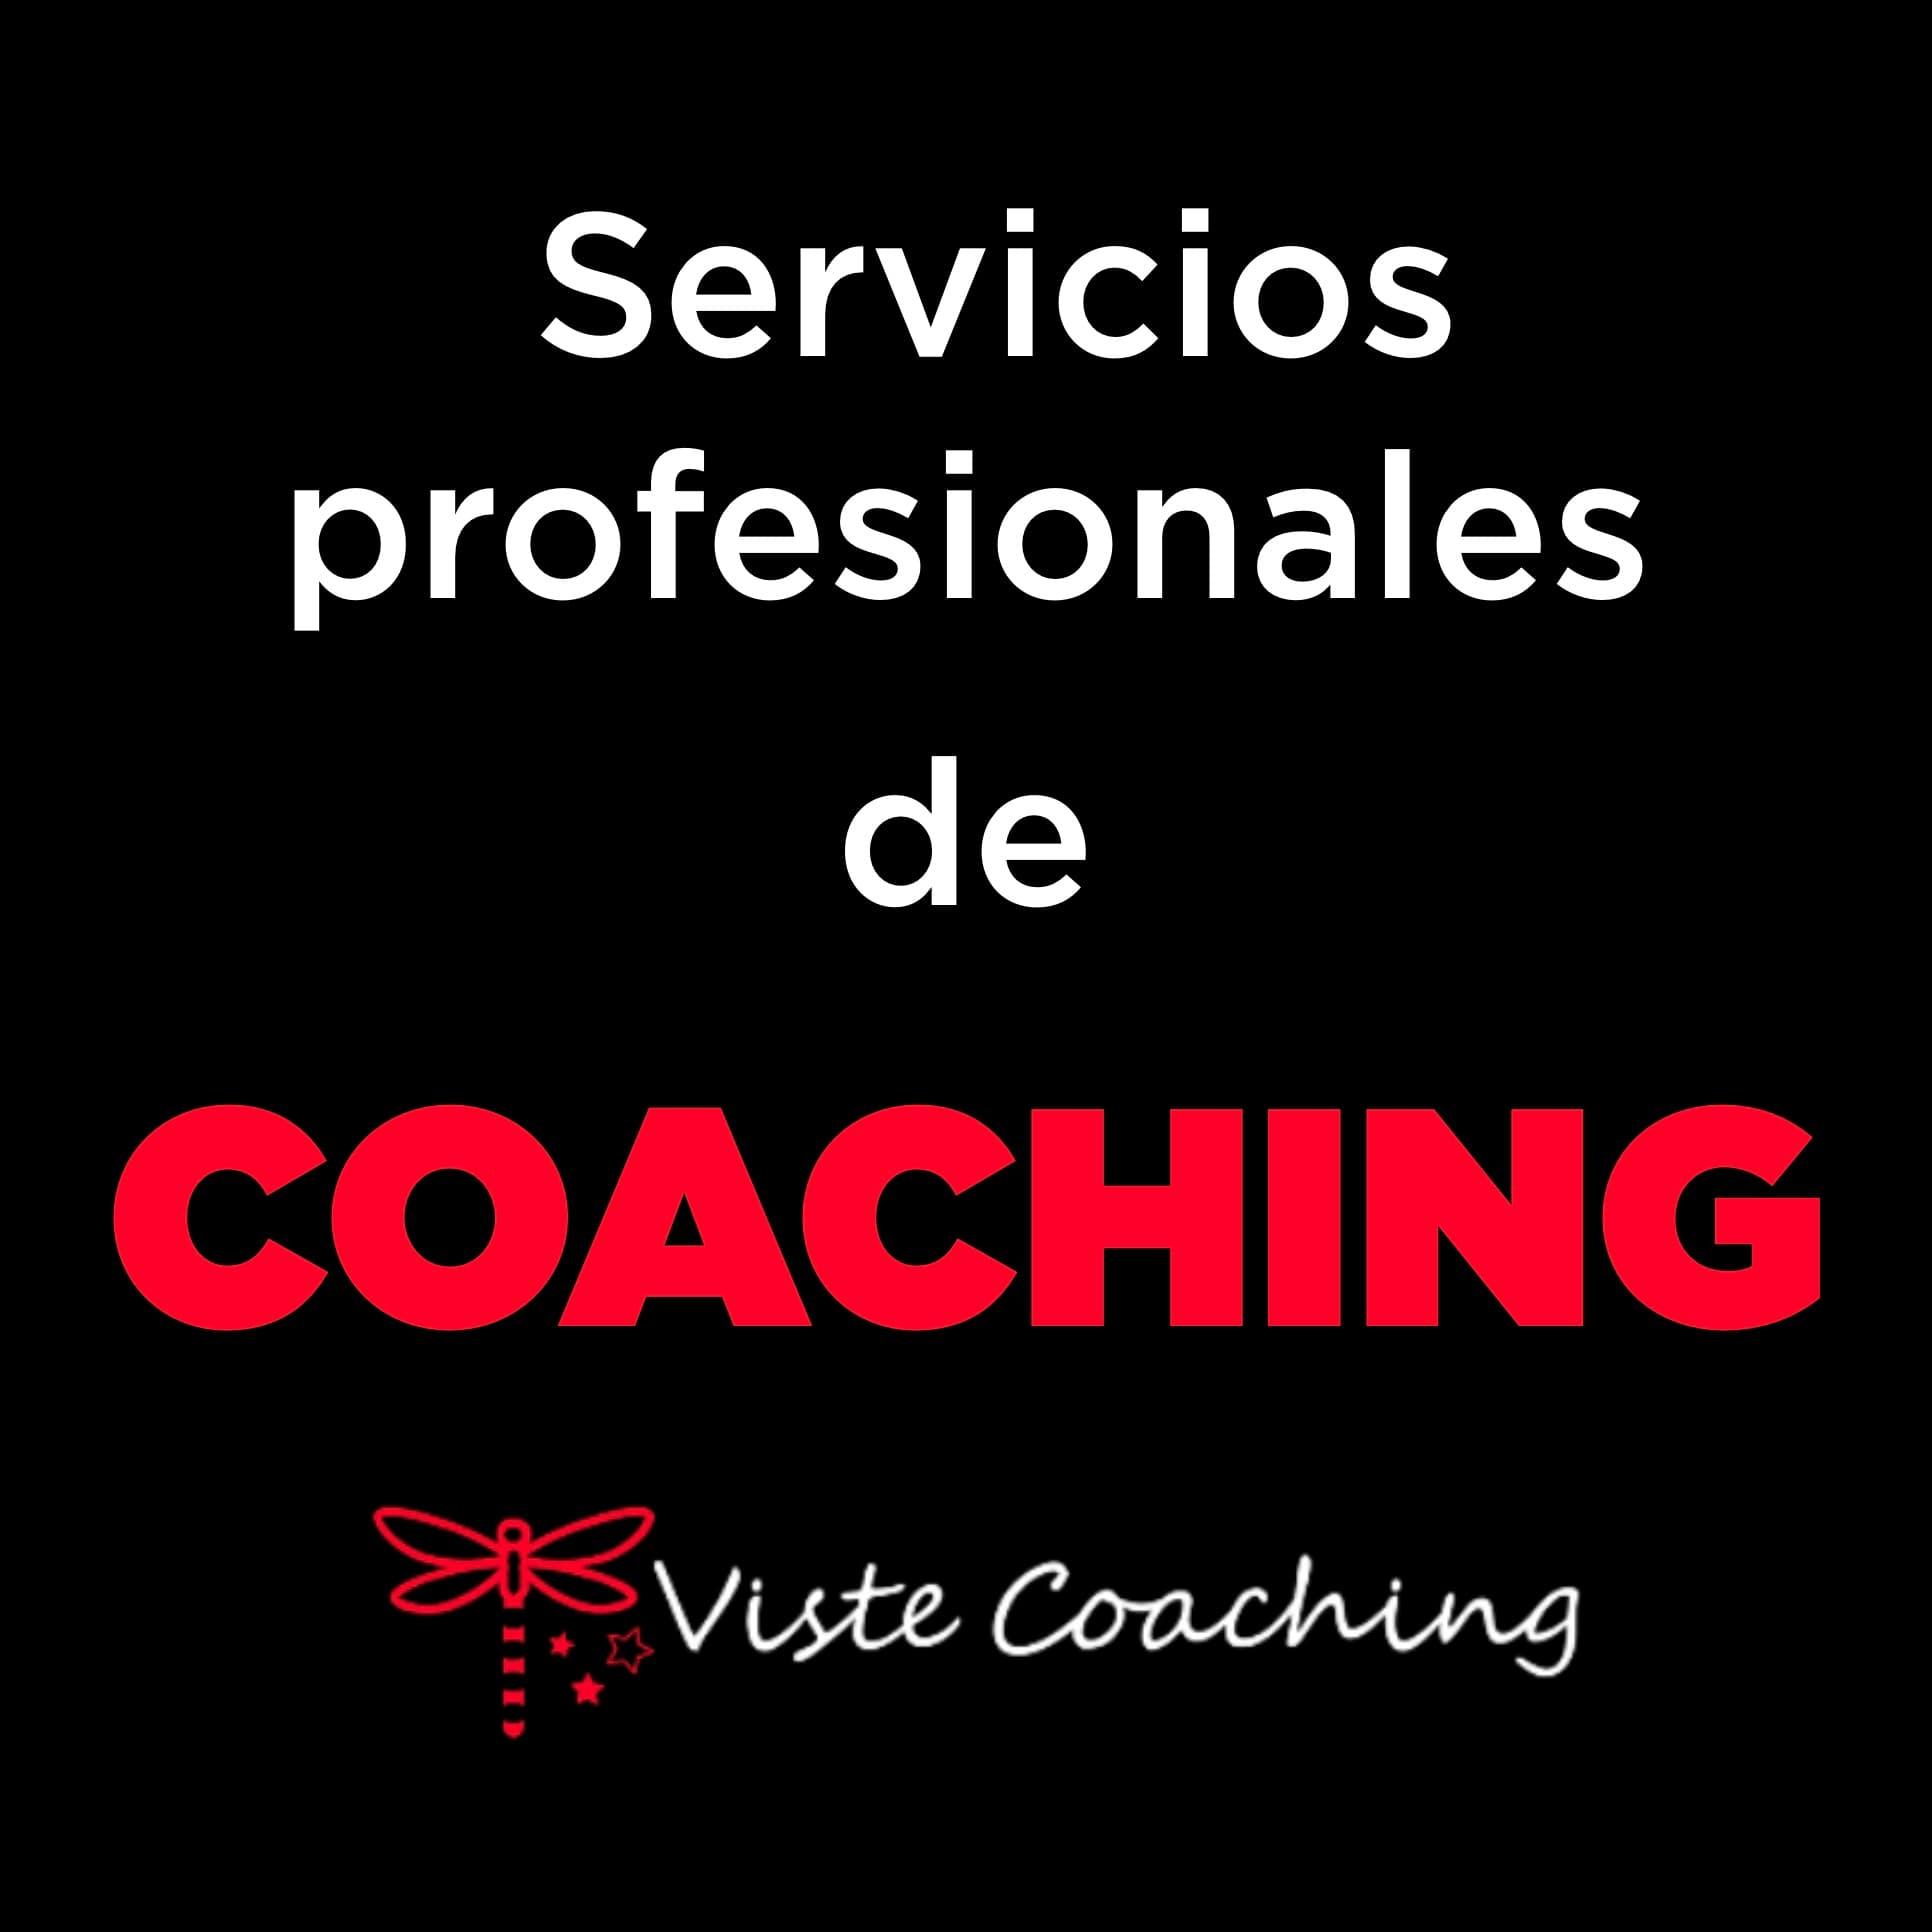 CoachingOnLine _VisteCoaching